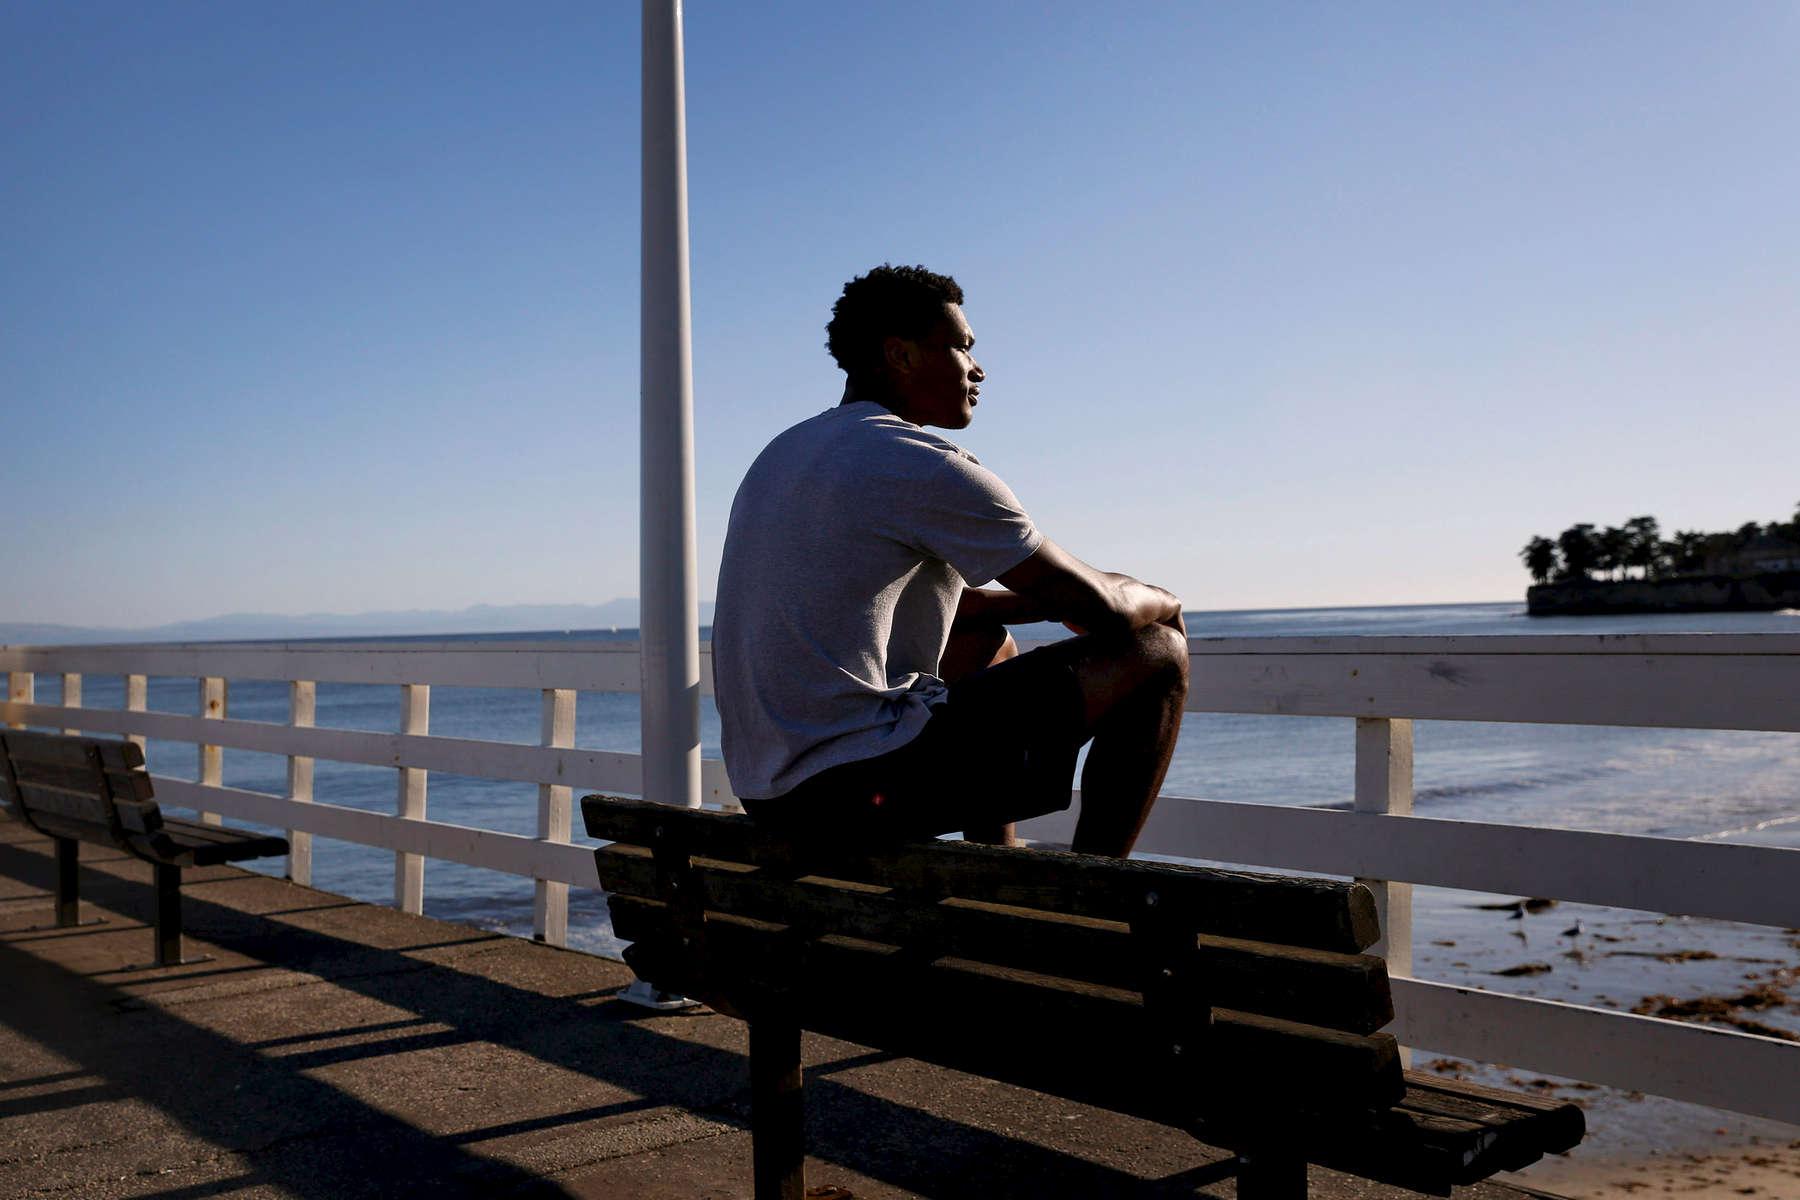 Santa Cruz, California - November 17, 2017: Golden State Warrior and Santa Cruz Warrior G League player Damian Jones, 22, poses for a portrait at the Santa Cruz Wharf.(Preston Gannaway/ for ESPN)